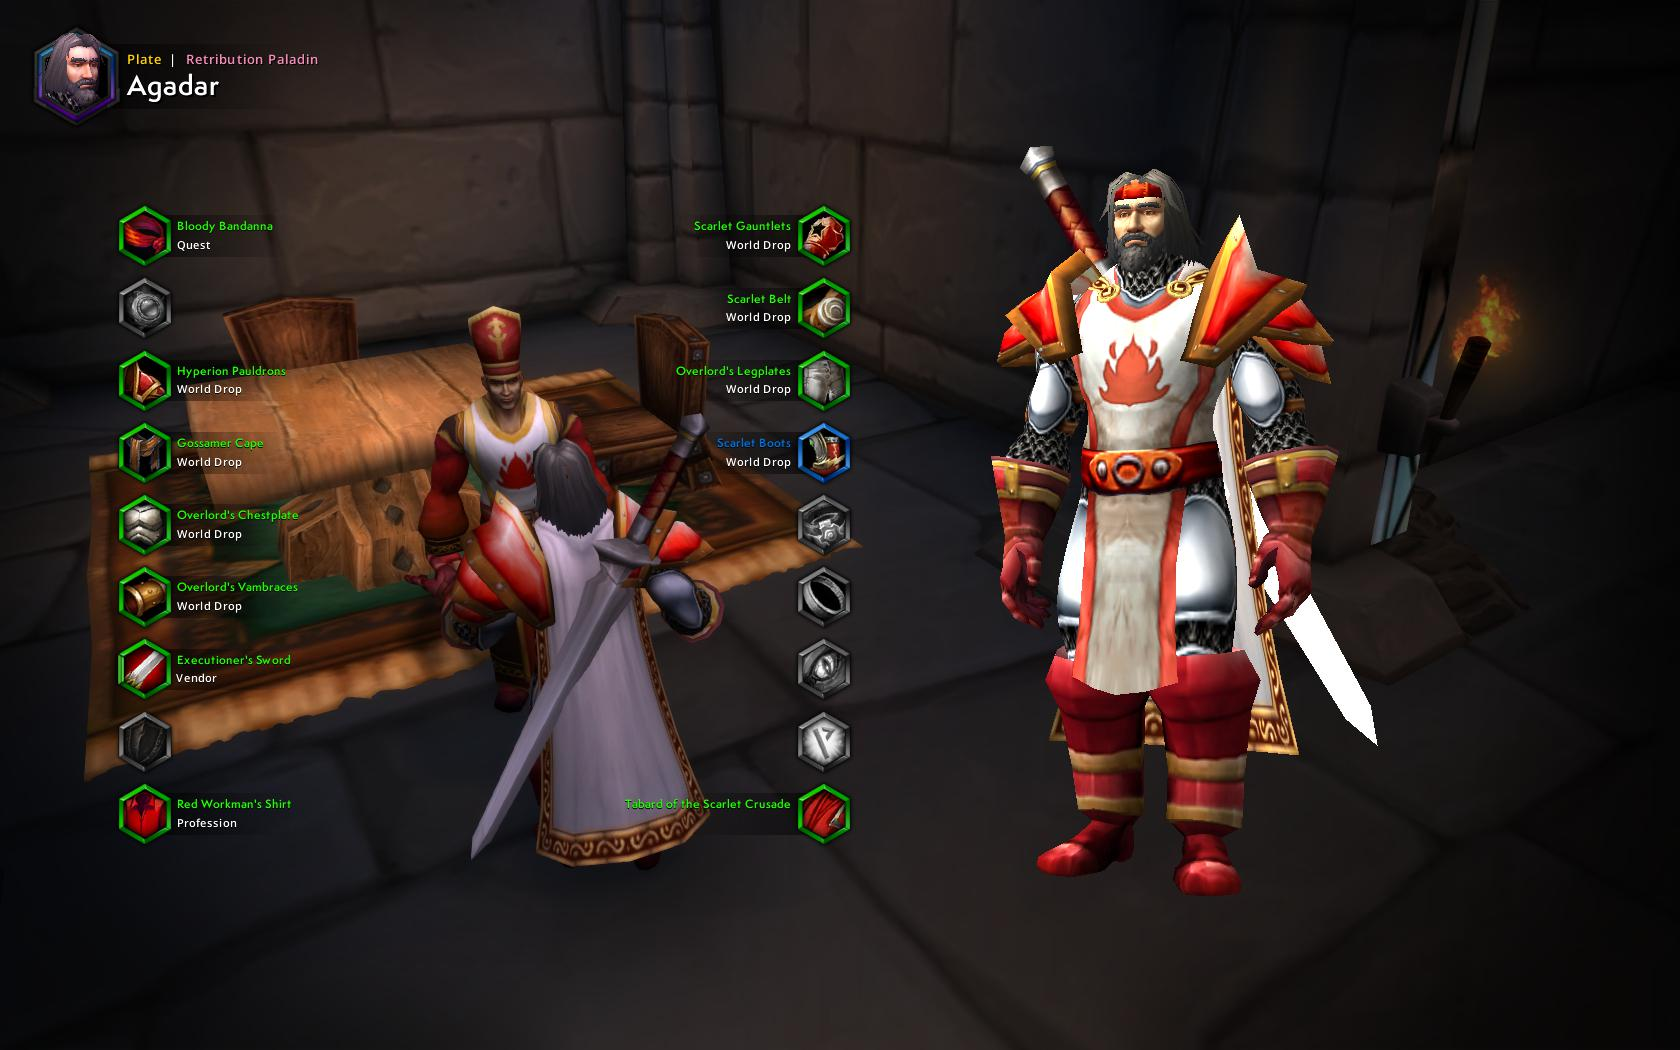 Scarlet Crusade Captain : Transmogrification